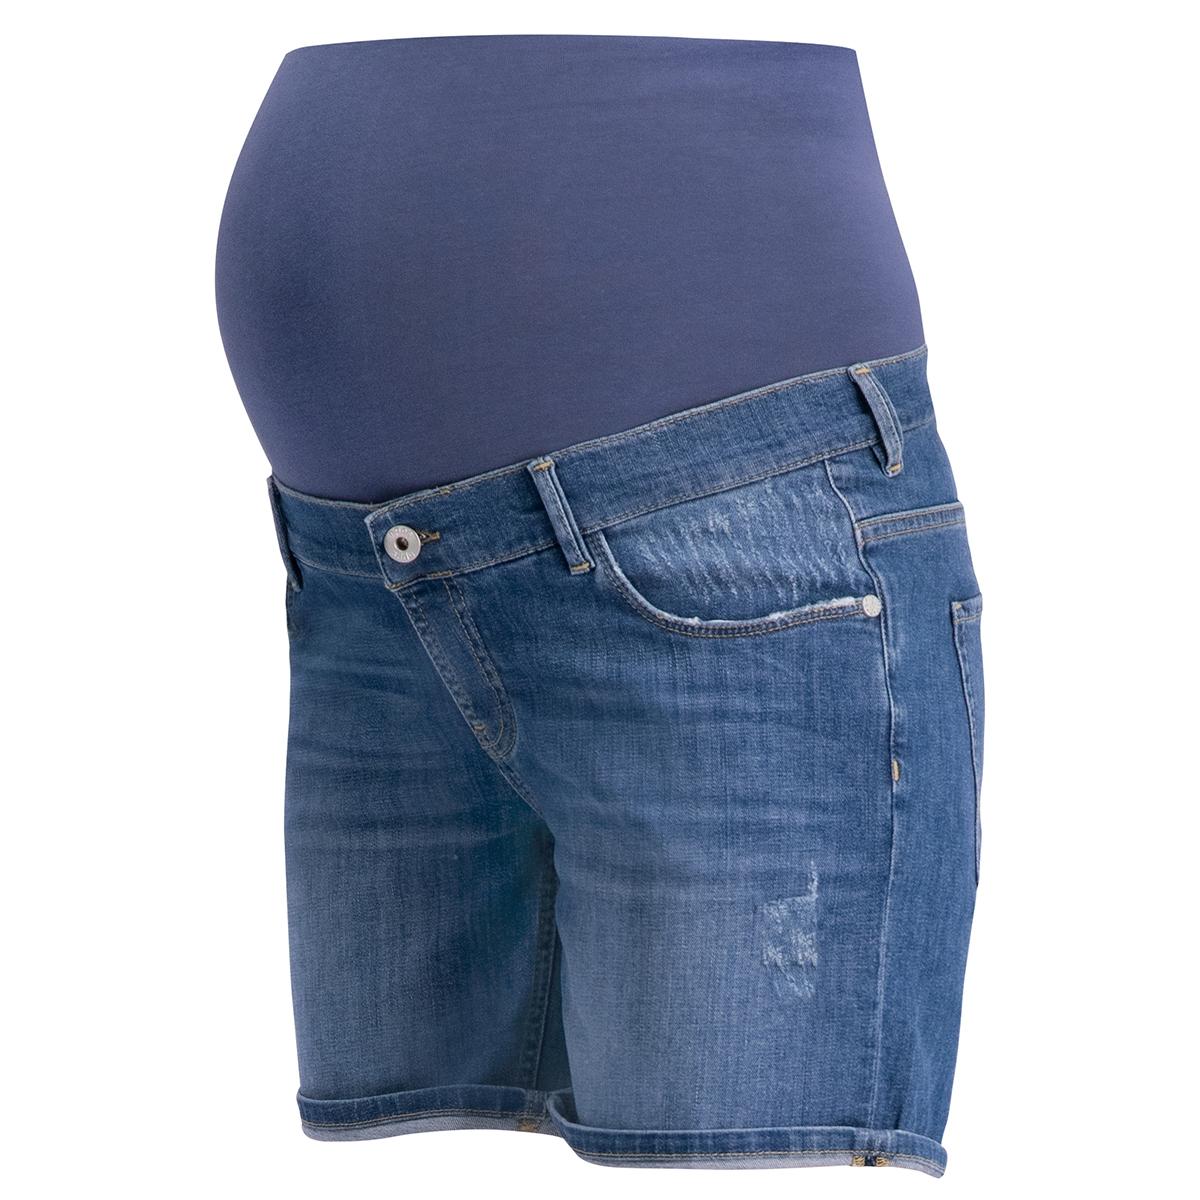 short denim otb pasha 90303 noppies positie broek vintage blue